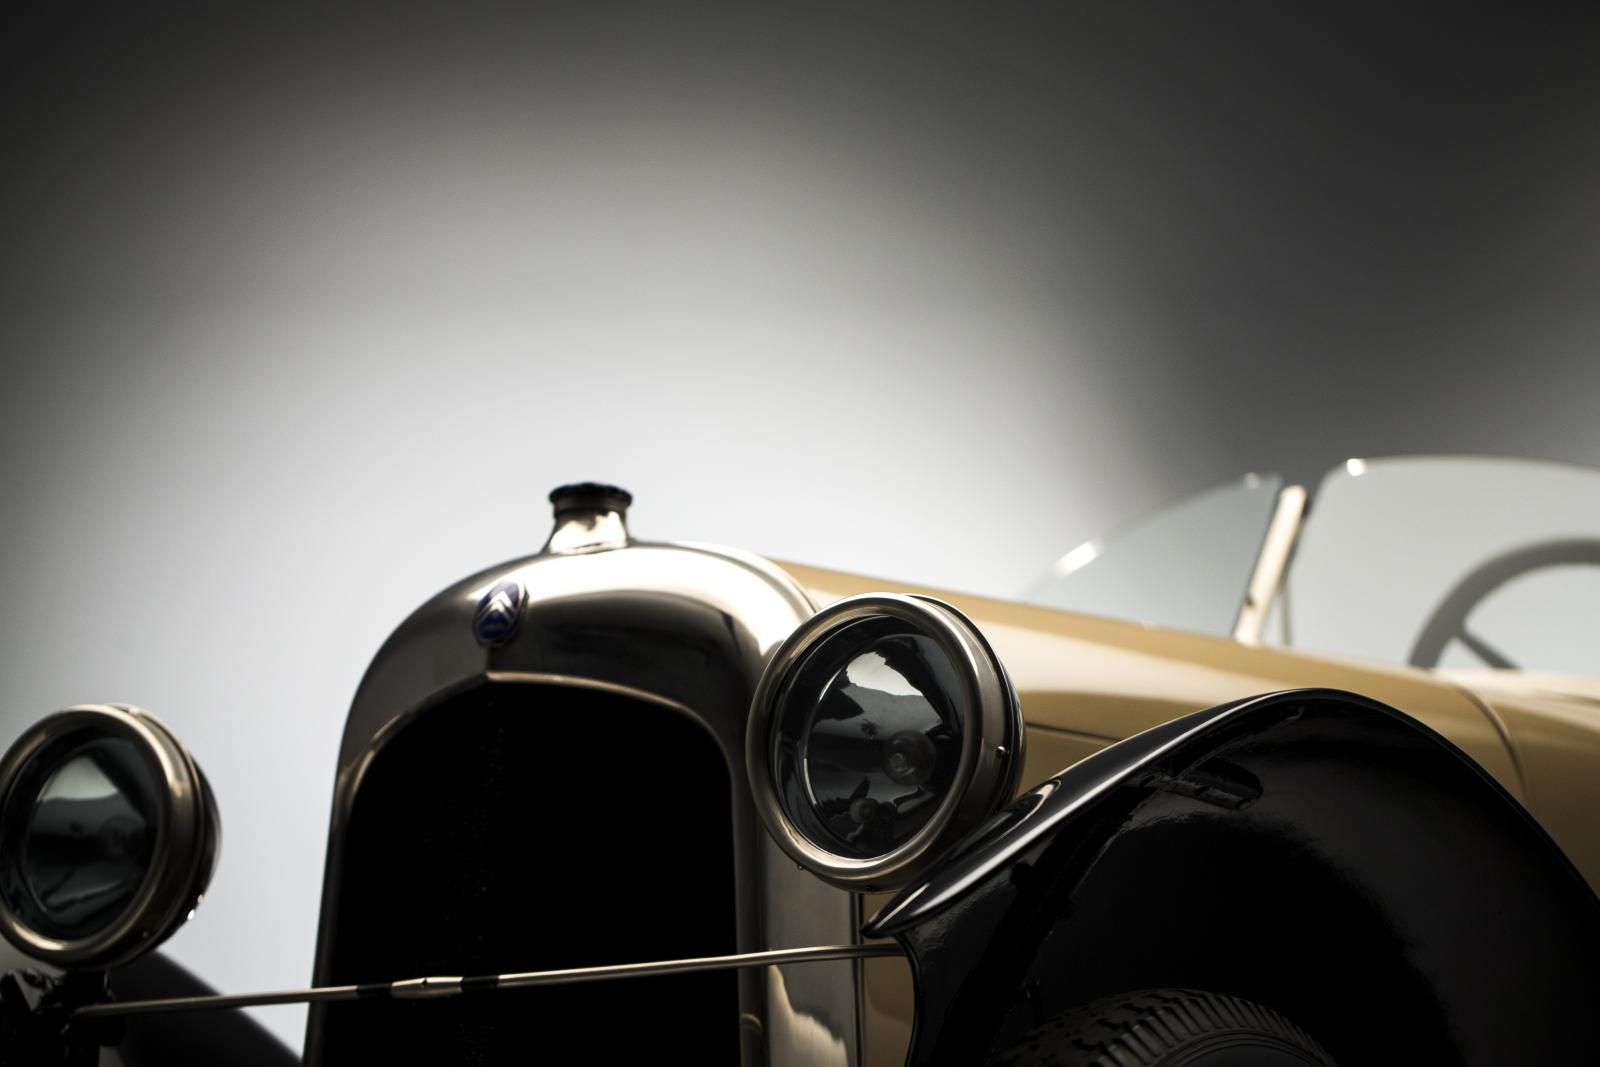 B2 Caddy - 3/4 dianteira